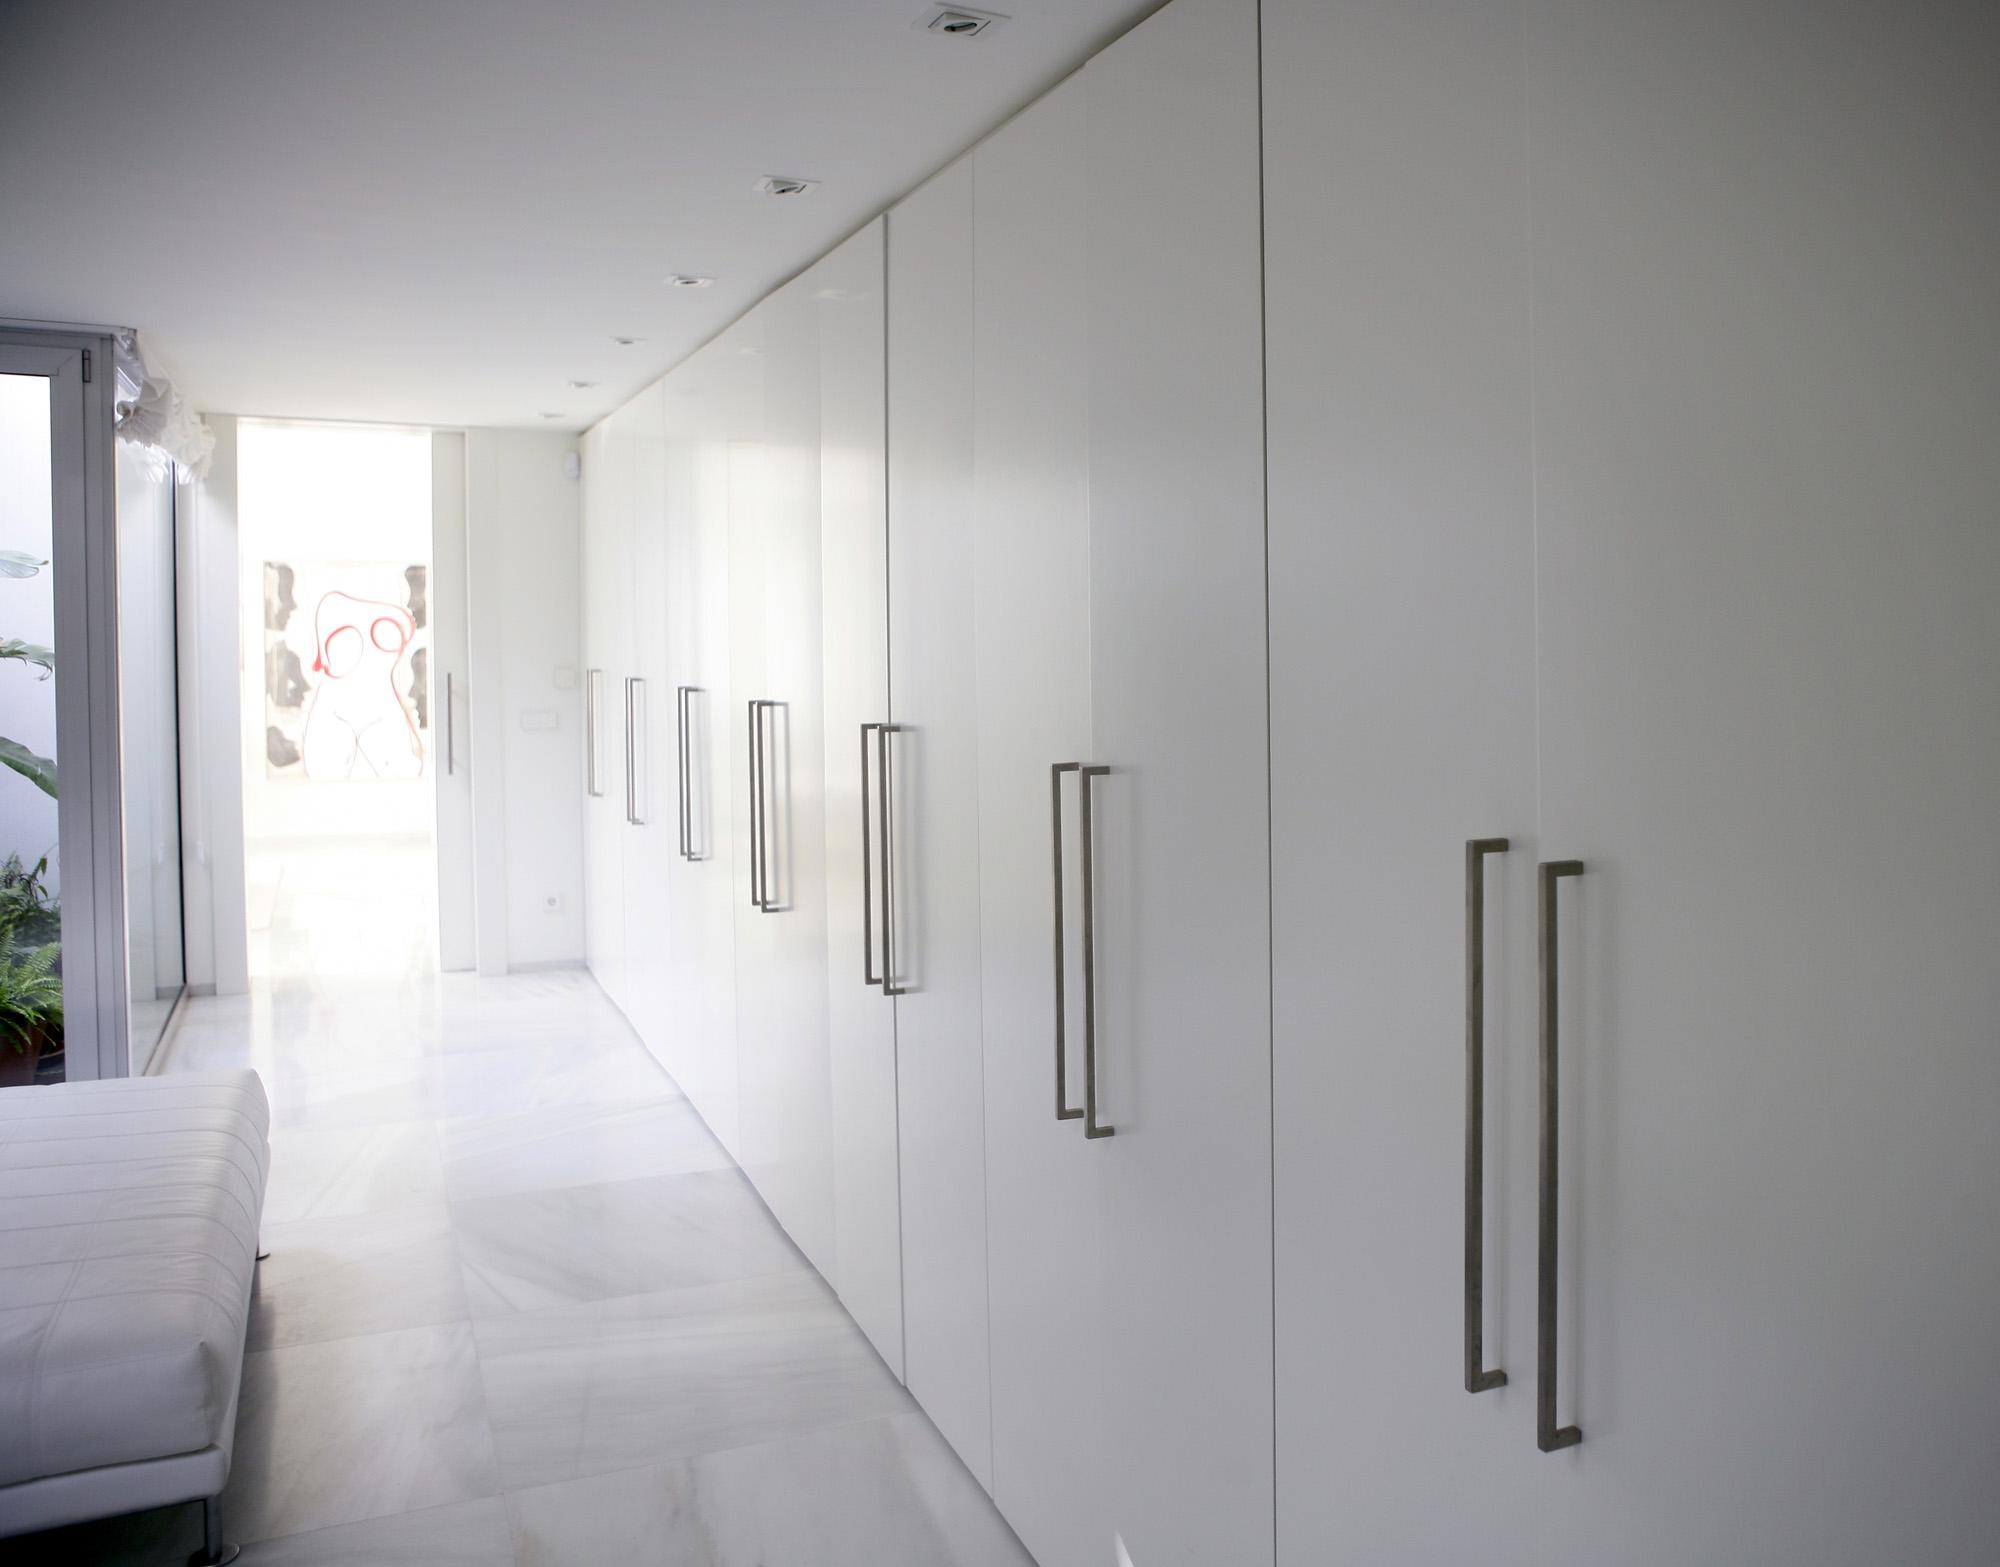 fitted modern wardrobes, wardrobe doors, built in wardrobes